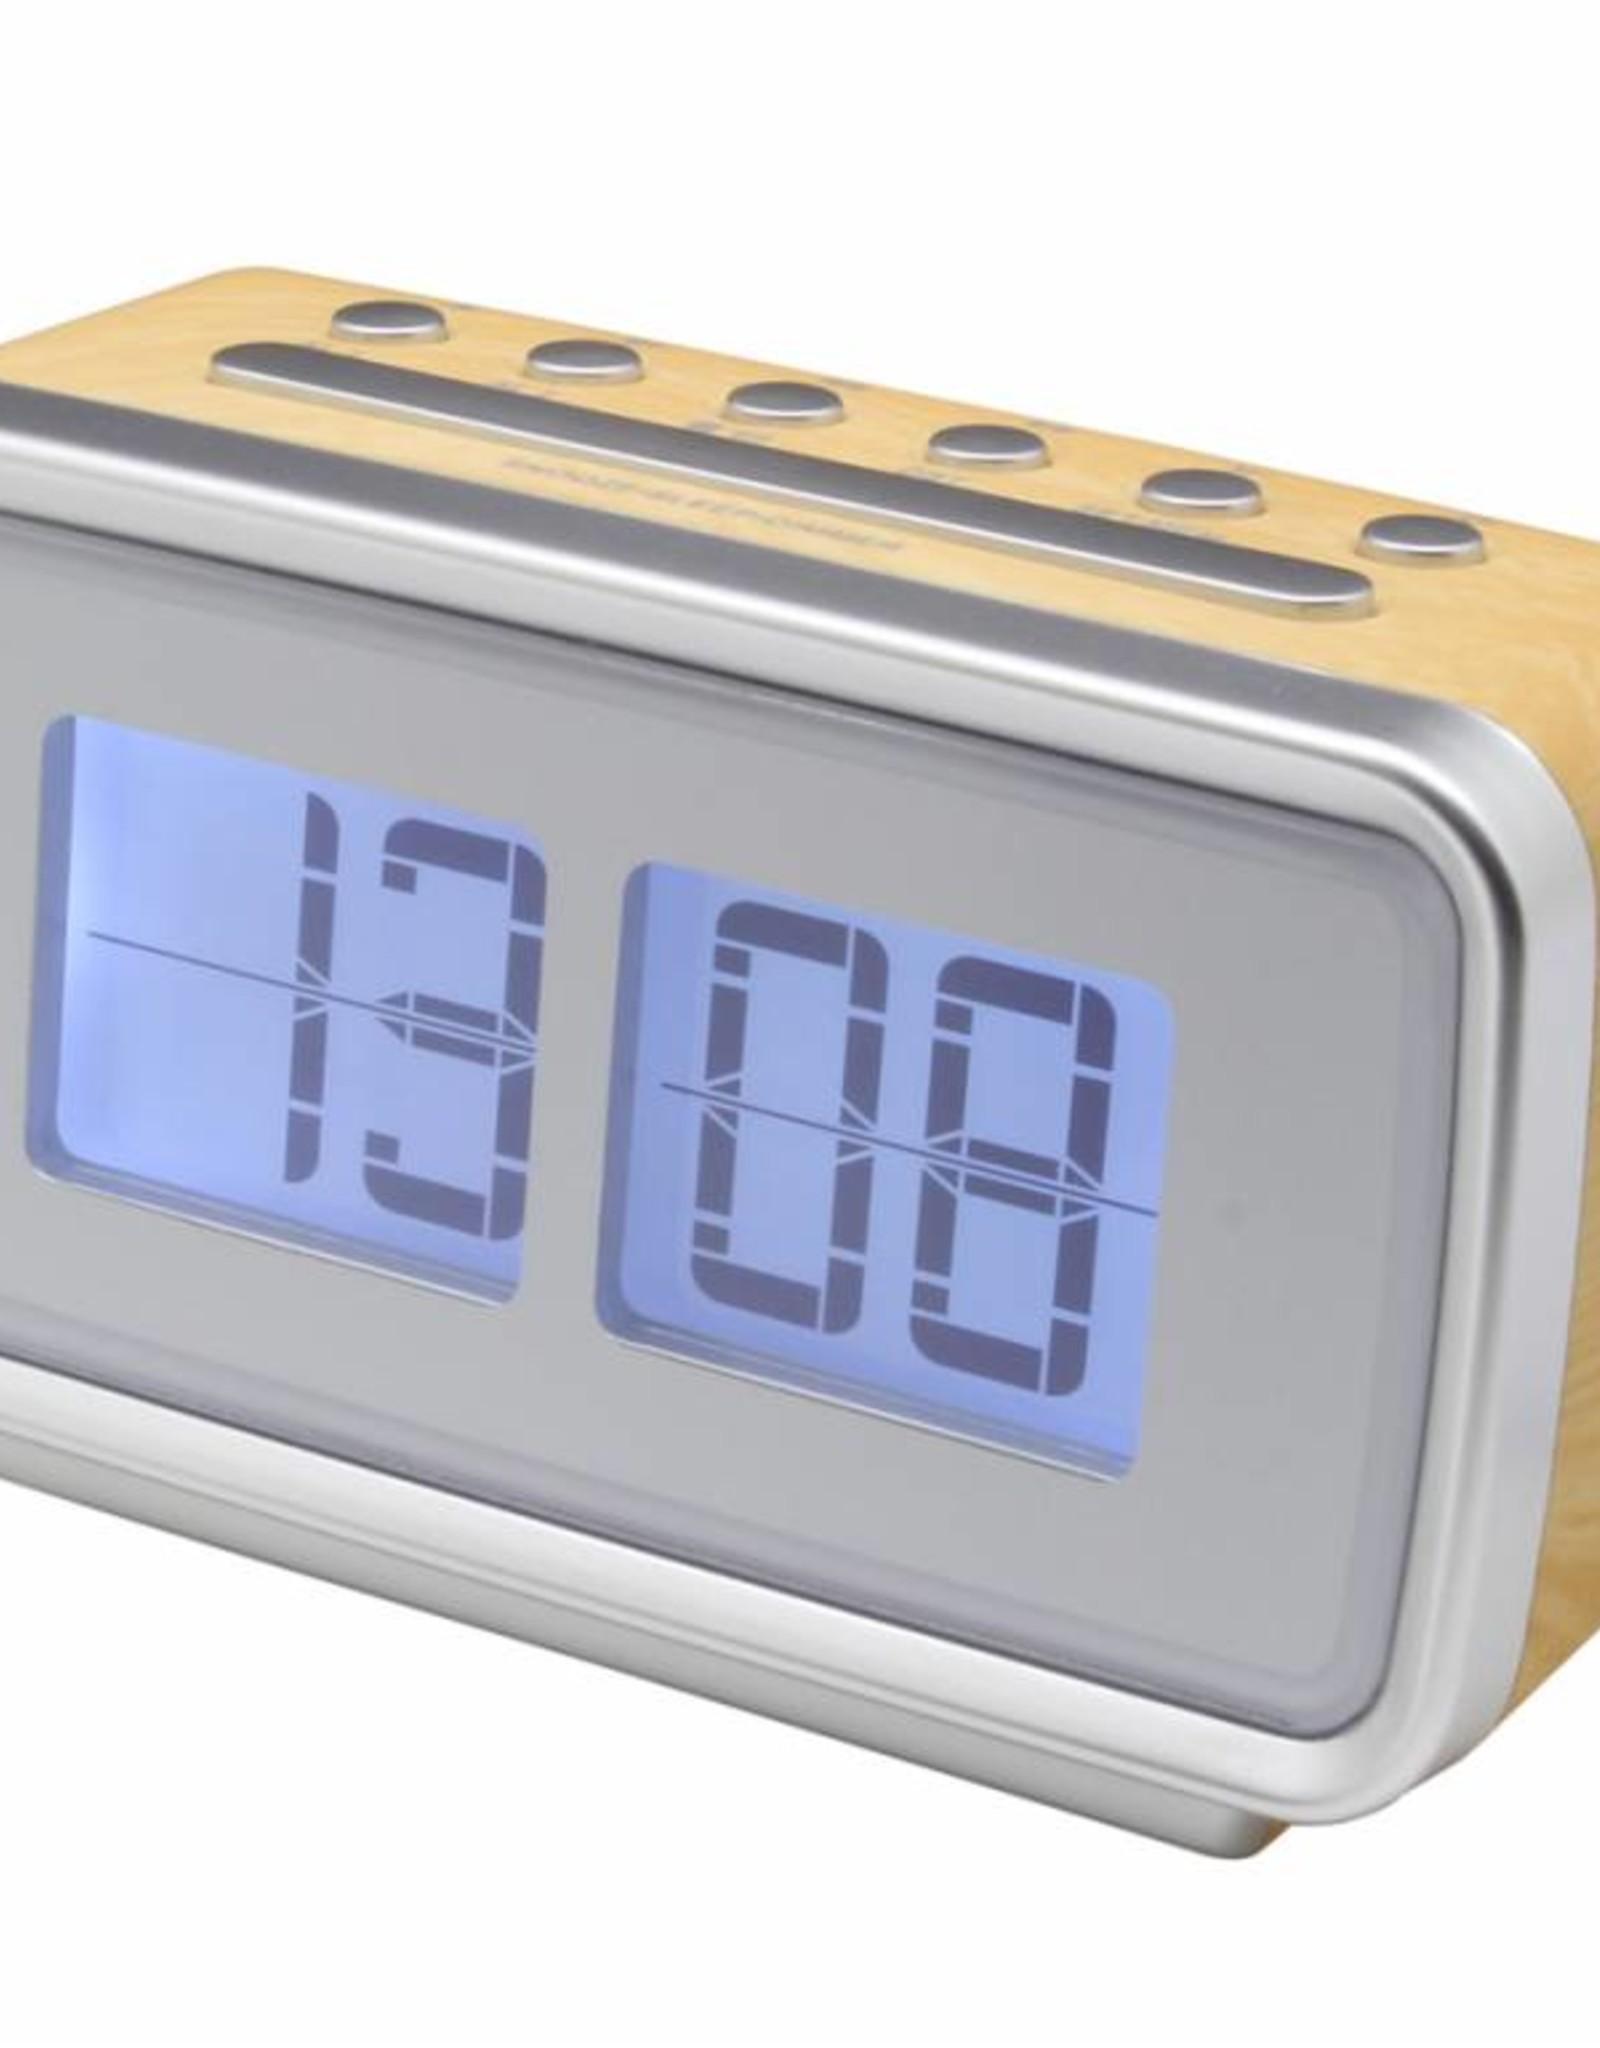 Soundmaster Wekkerradio in retro stijl UR105 lichte houtkleur